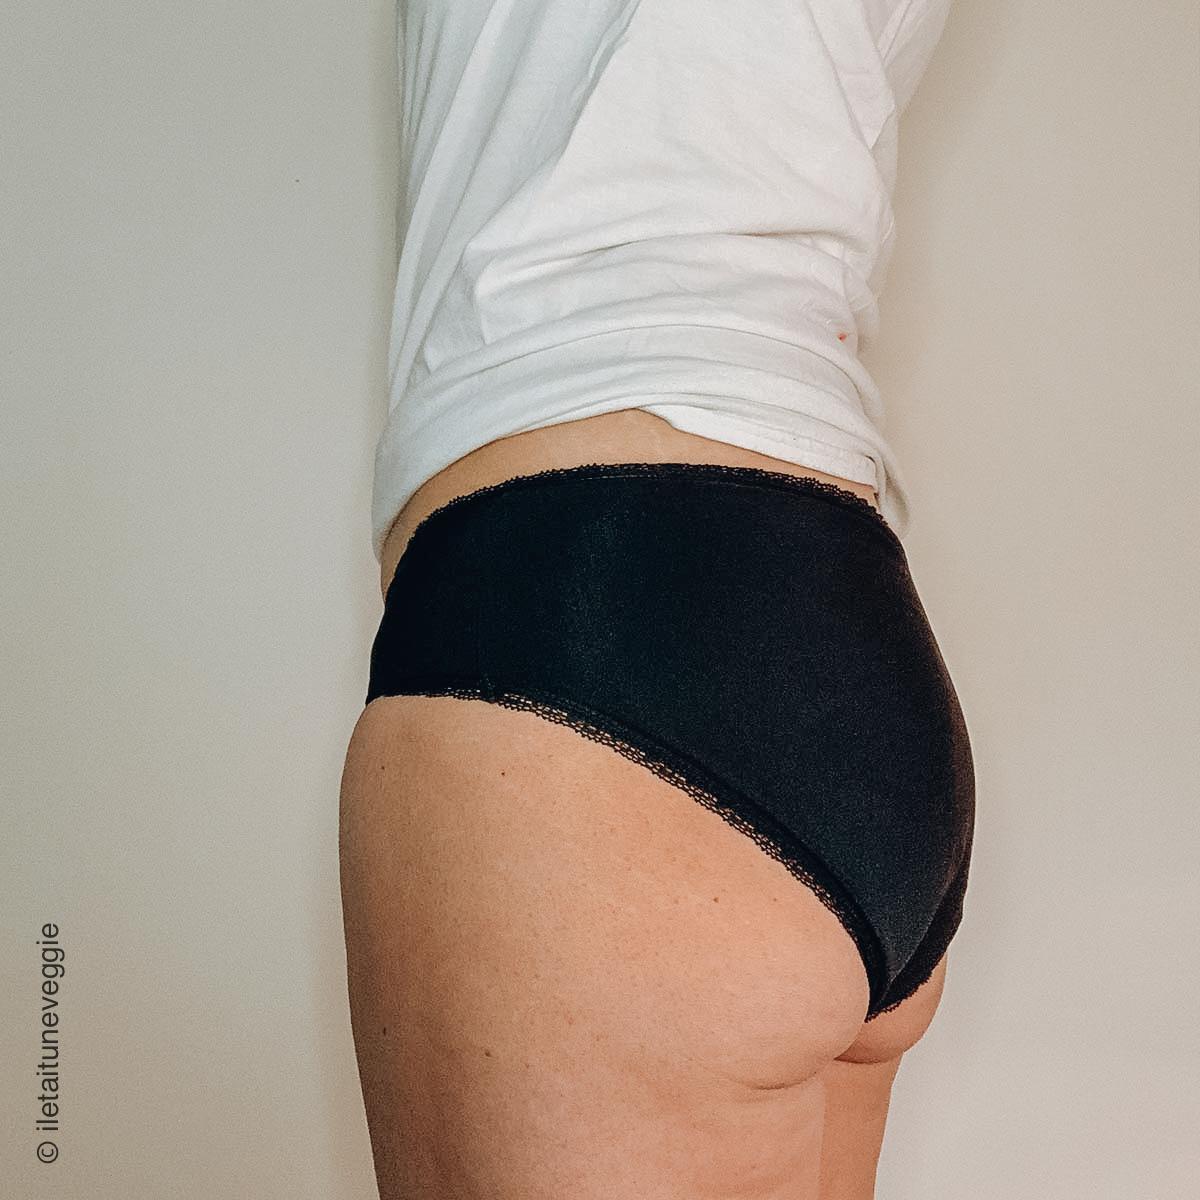 culotte menstruelle rejeanne il etait une veggie